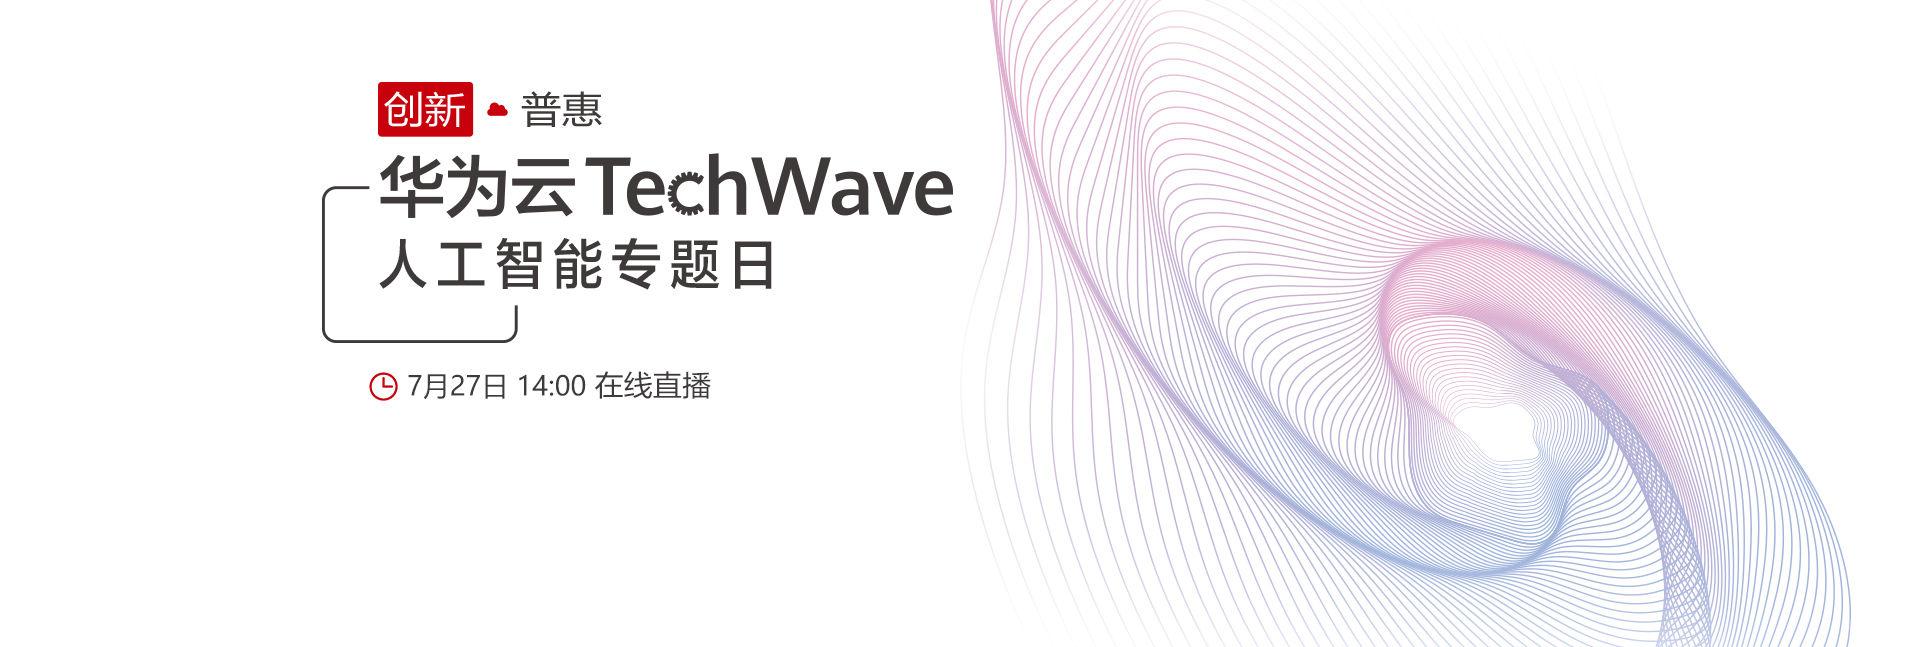 hwcloud techwave ai